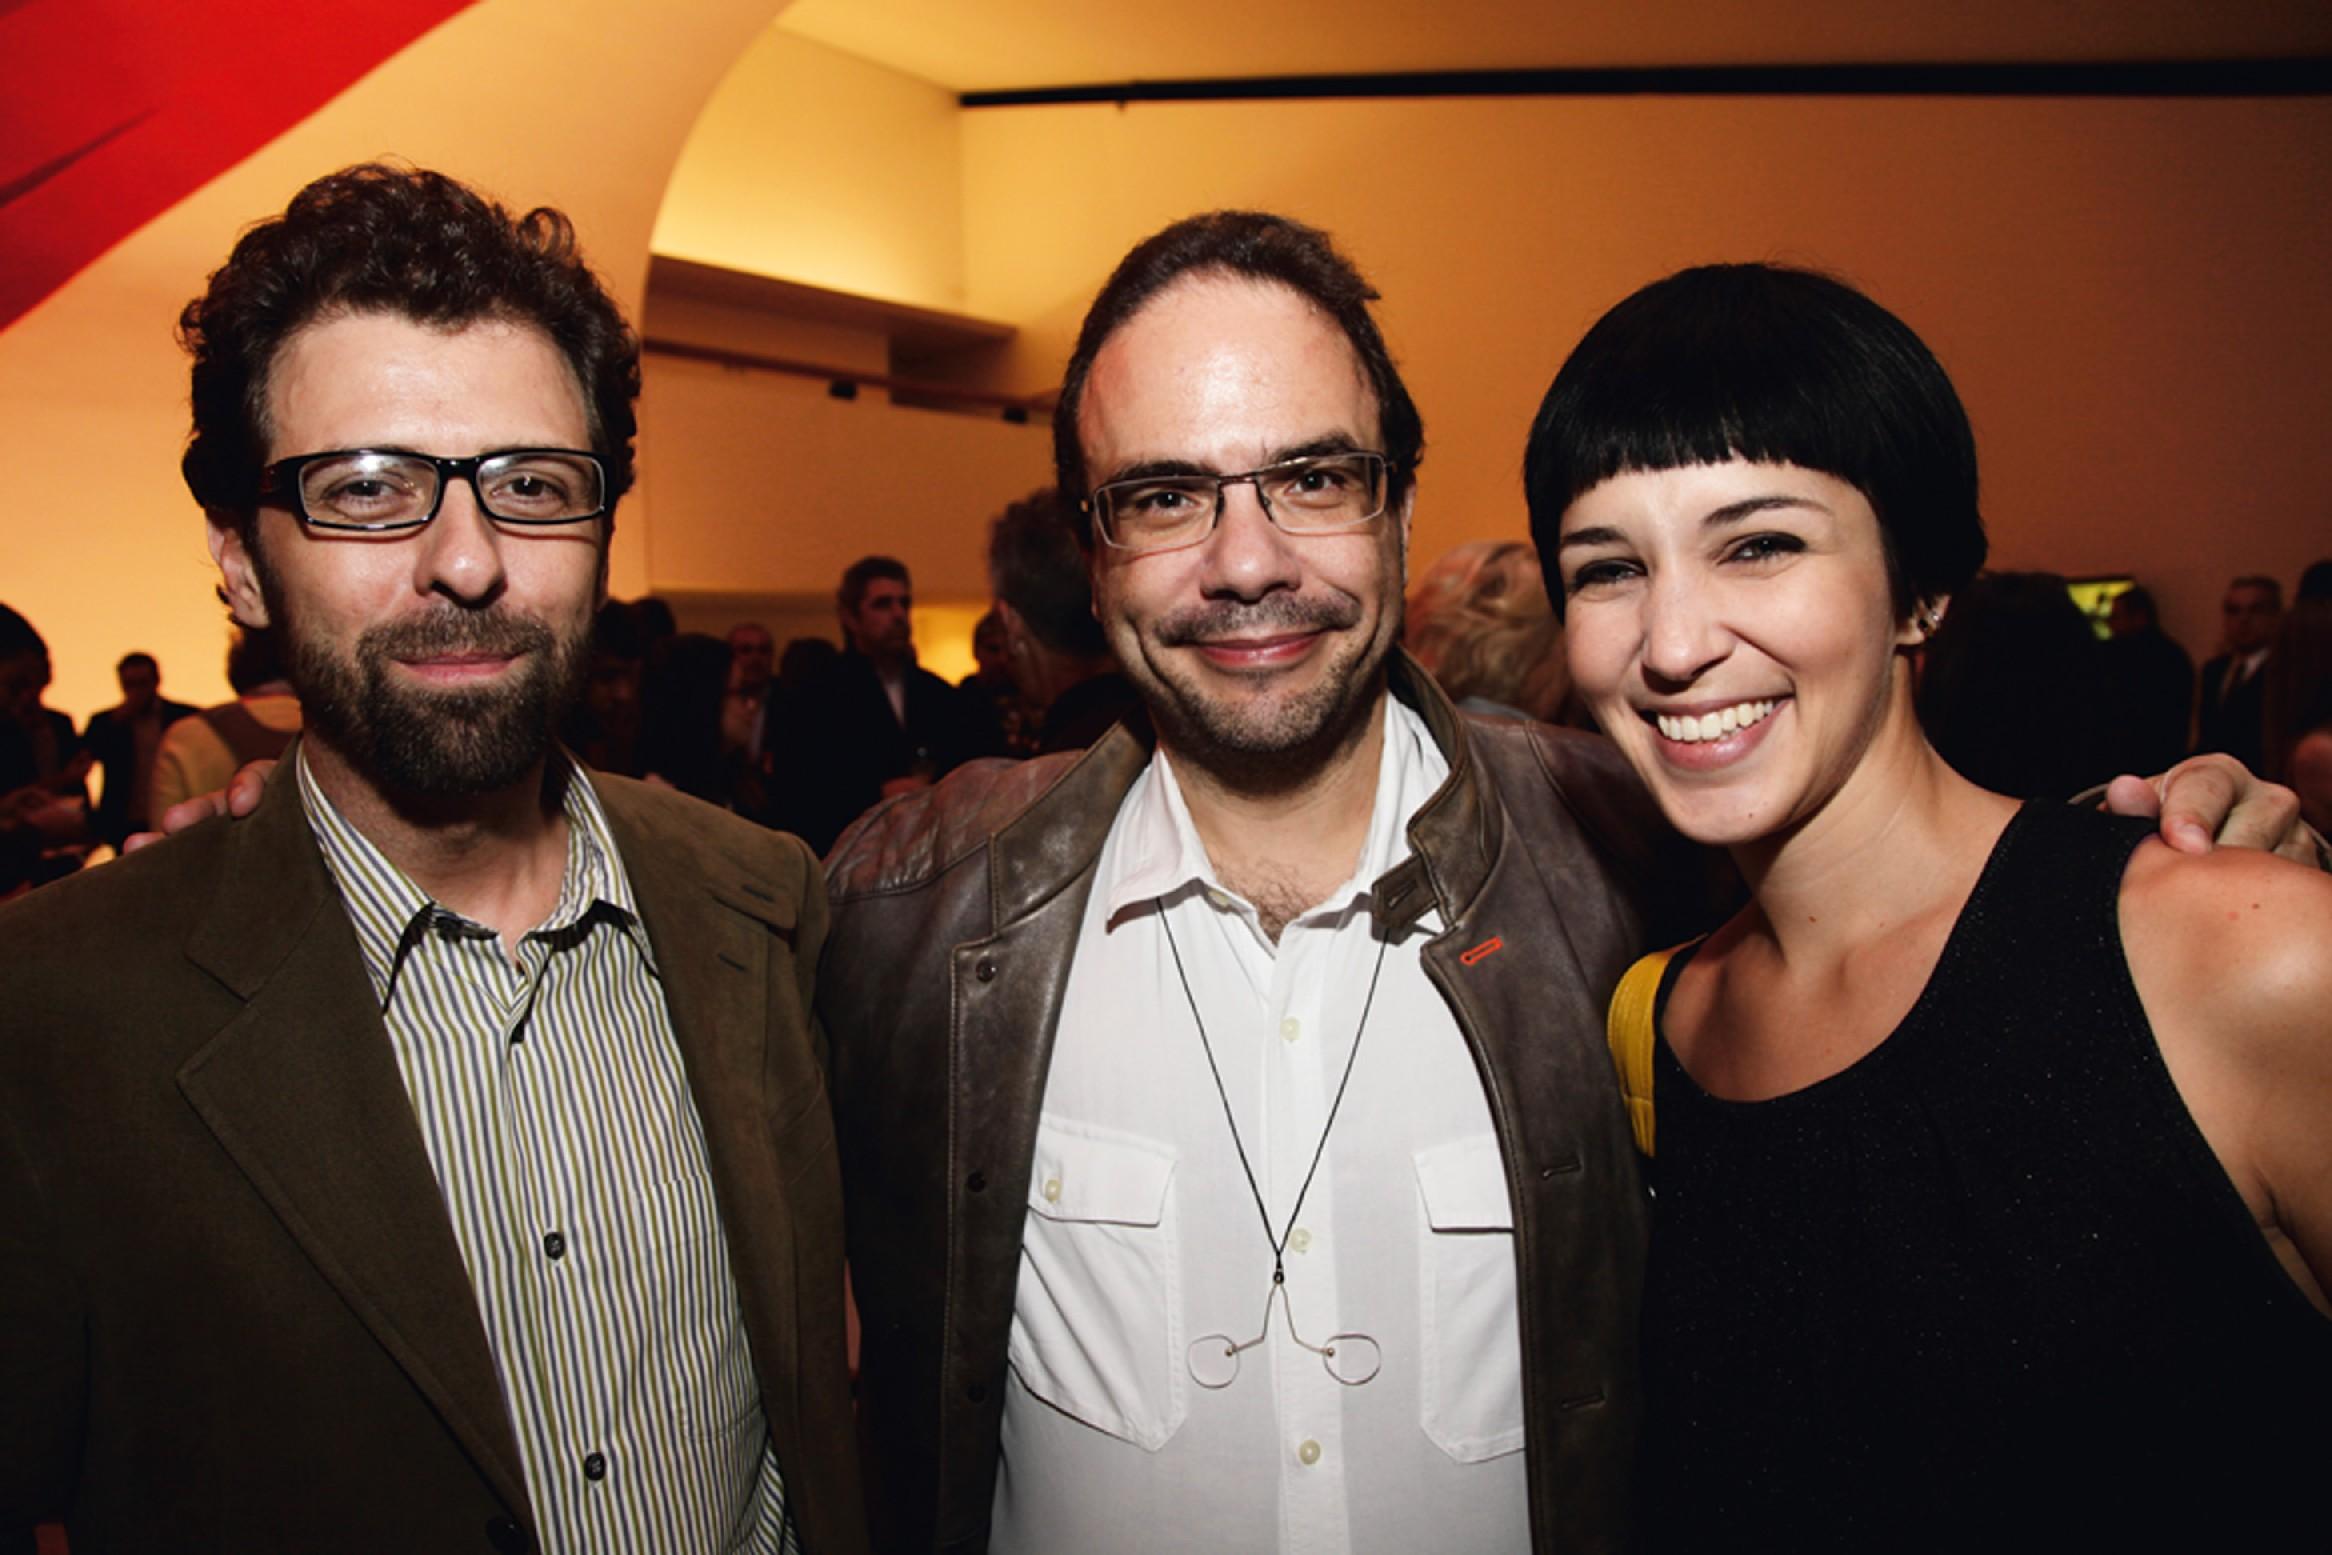 Marcello Dantas e Amanda Dafoe